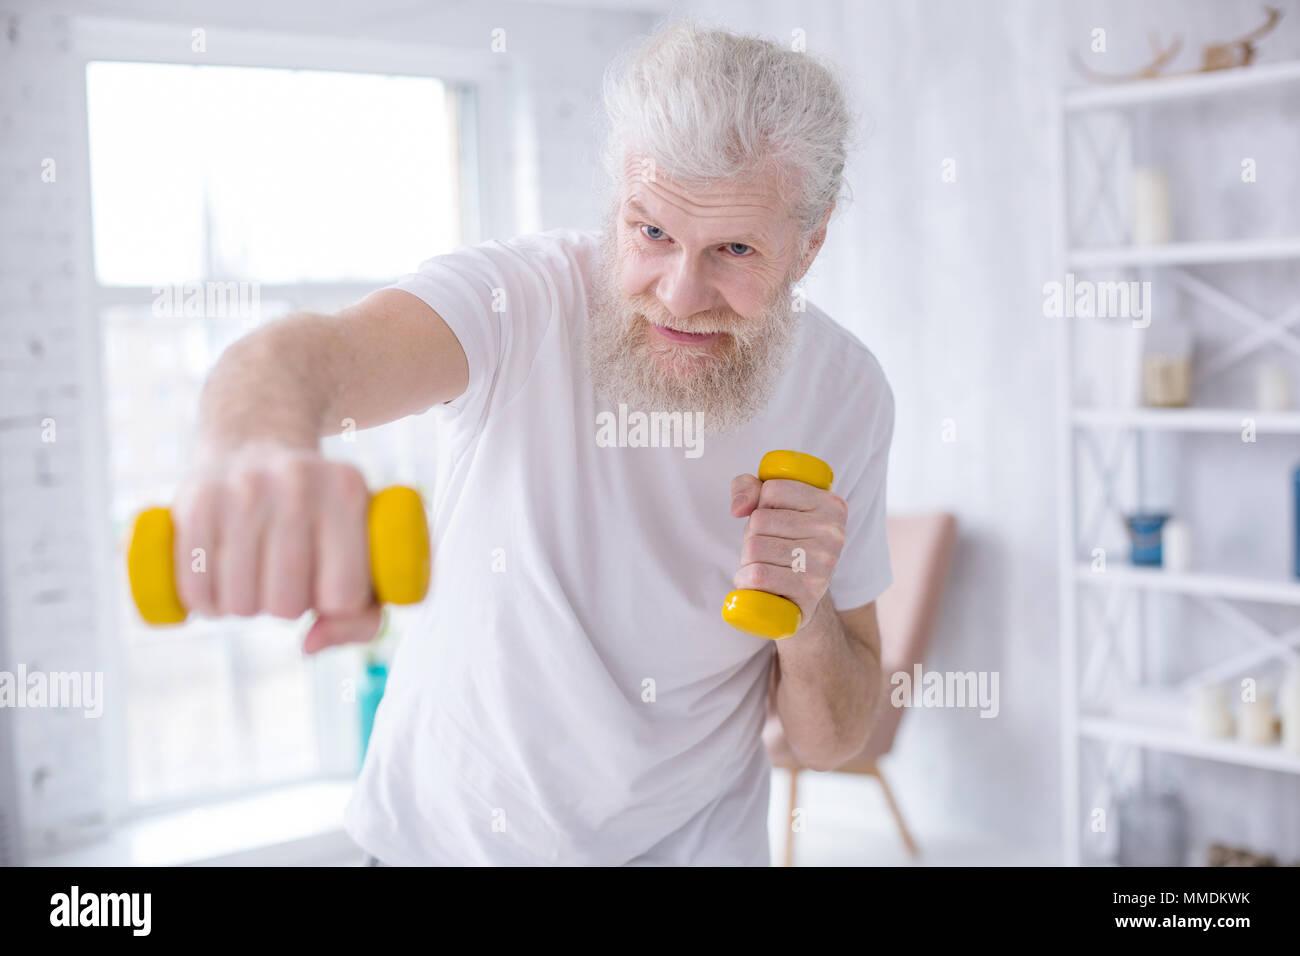 Elderly bearded man practicing jabs with dumbbells - Stock Image